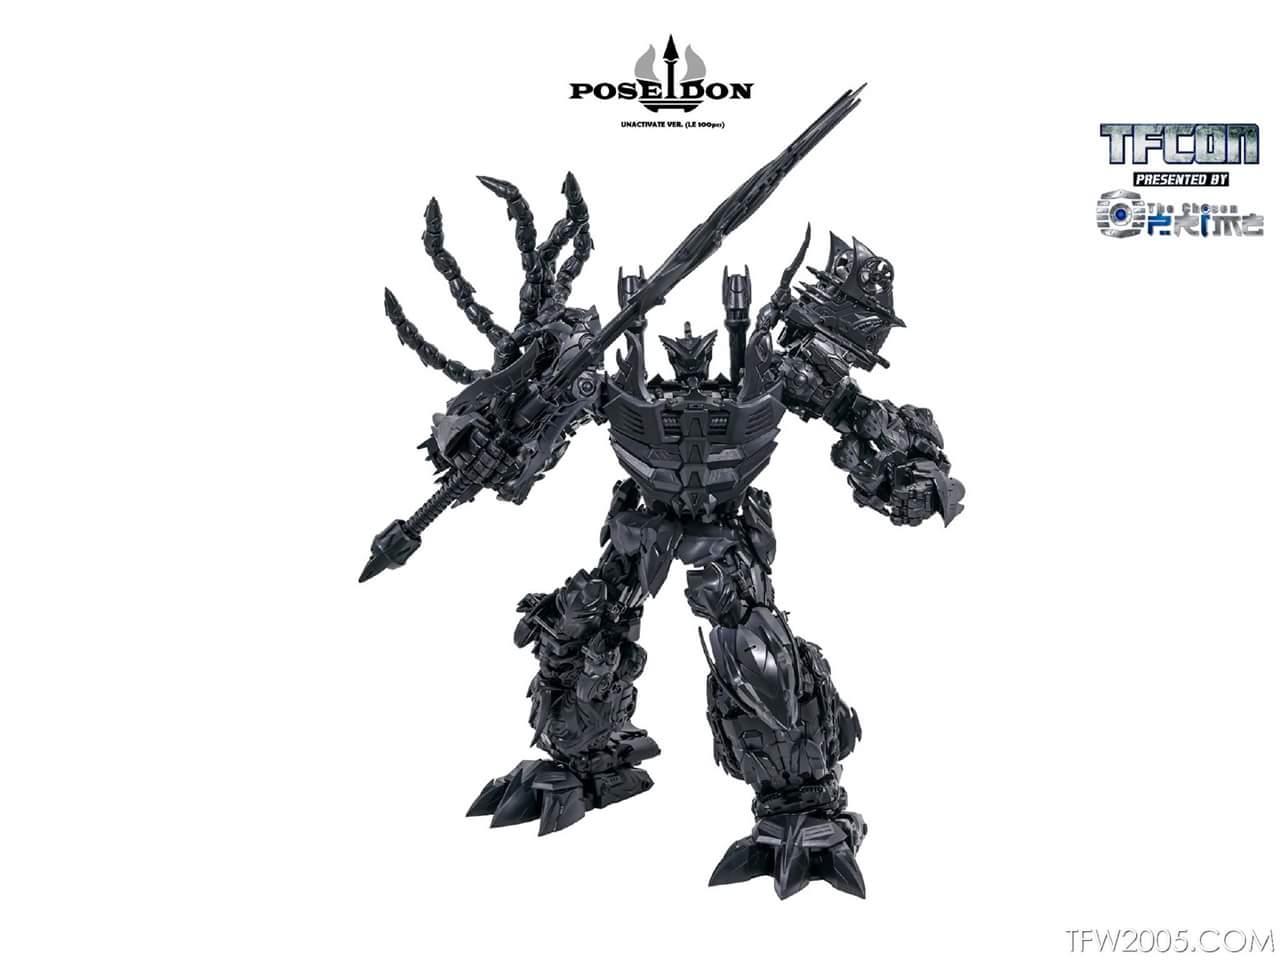 [TFC Toys] Produit Tiers - Jouet Poseidon - aka Piranacon/King Poseidon (TF Masterforce) - Page 6 3ZZ0tmgd_o